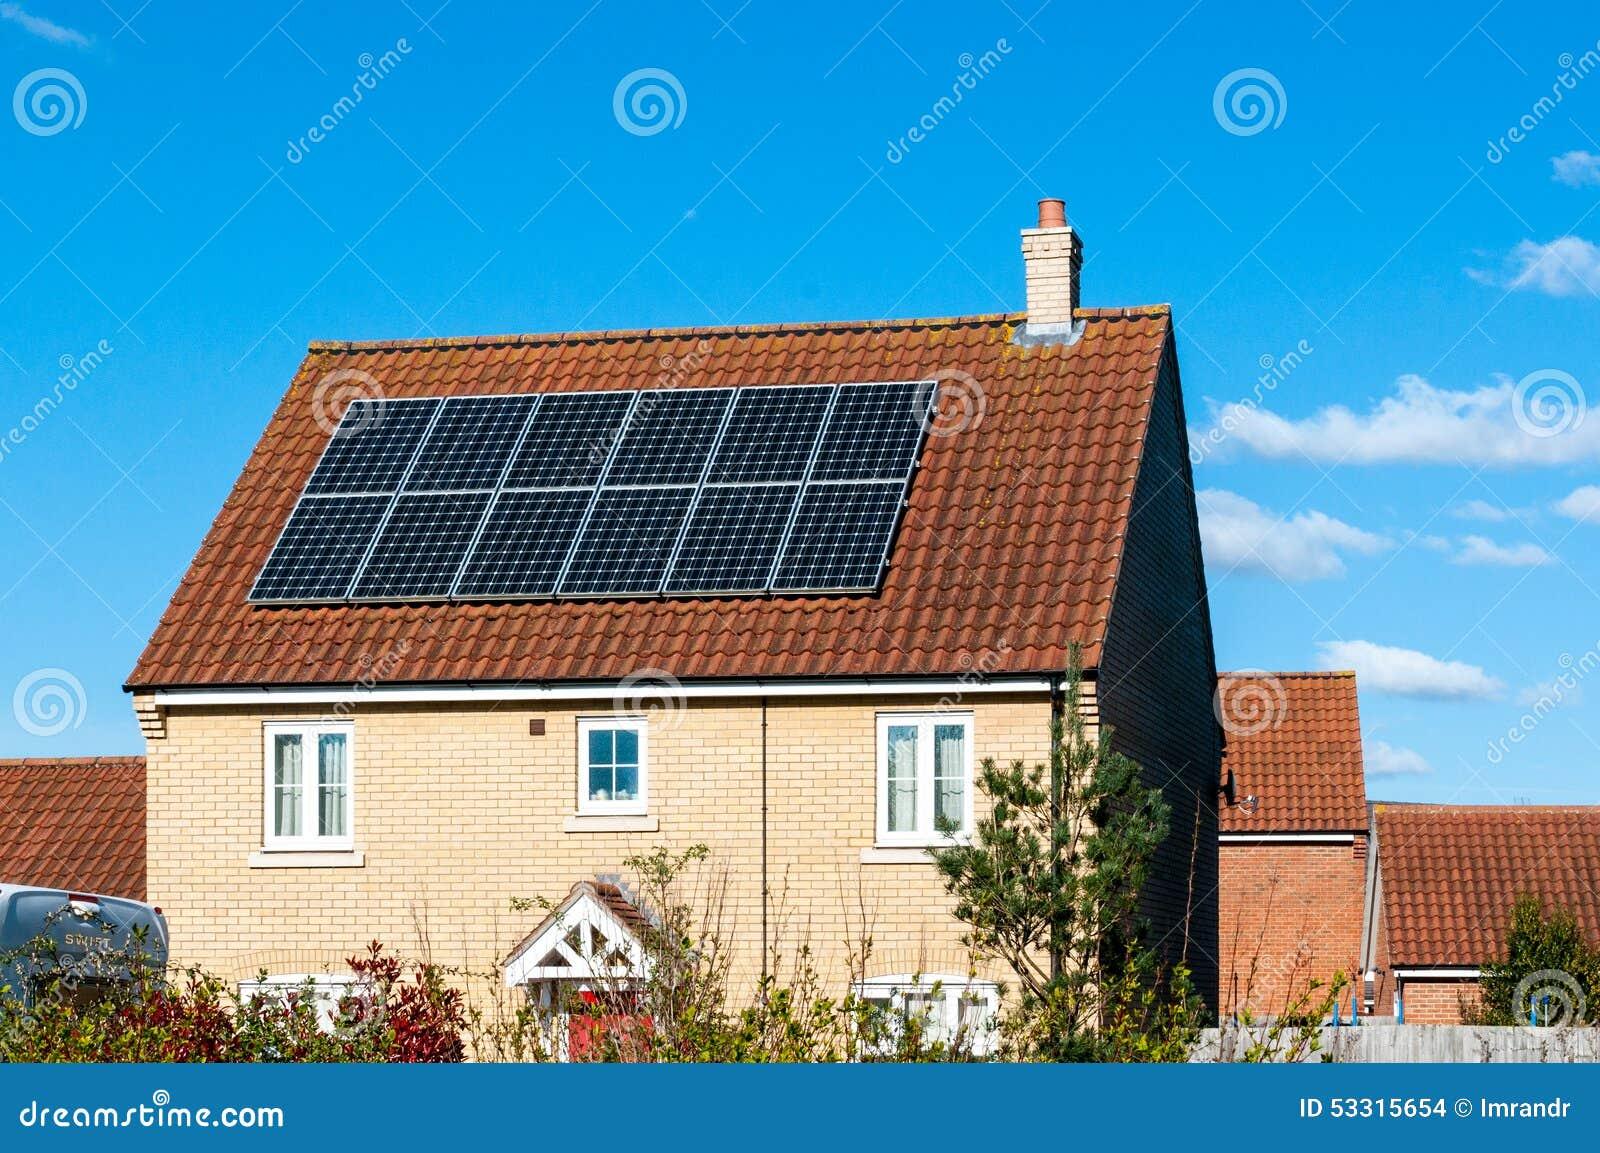 Solar Photovoltaic Panel Array On House Roof Against A Blue Sky Stock ...